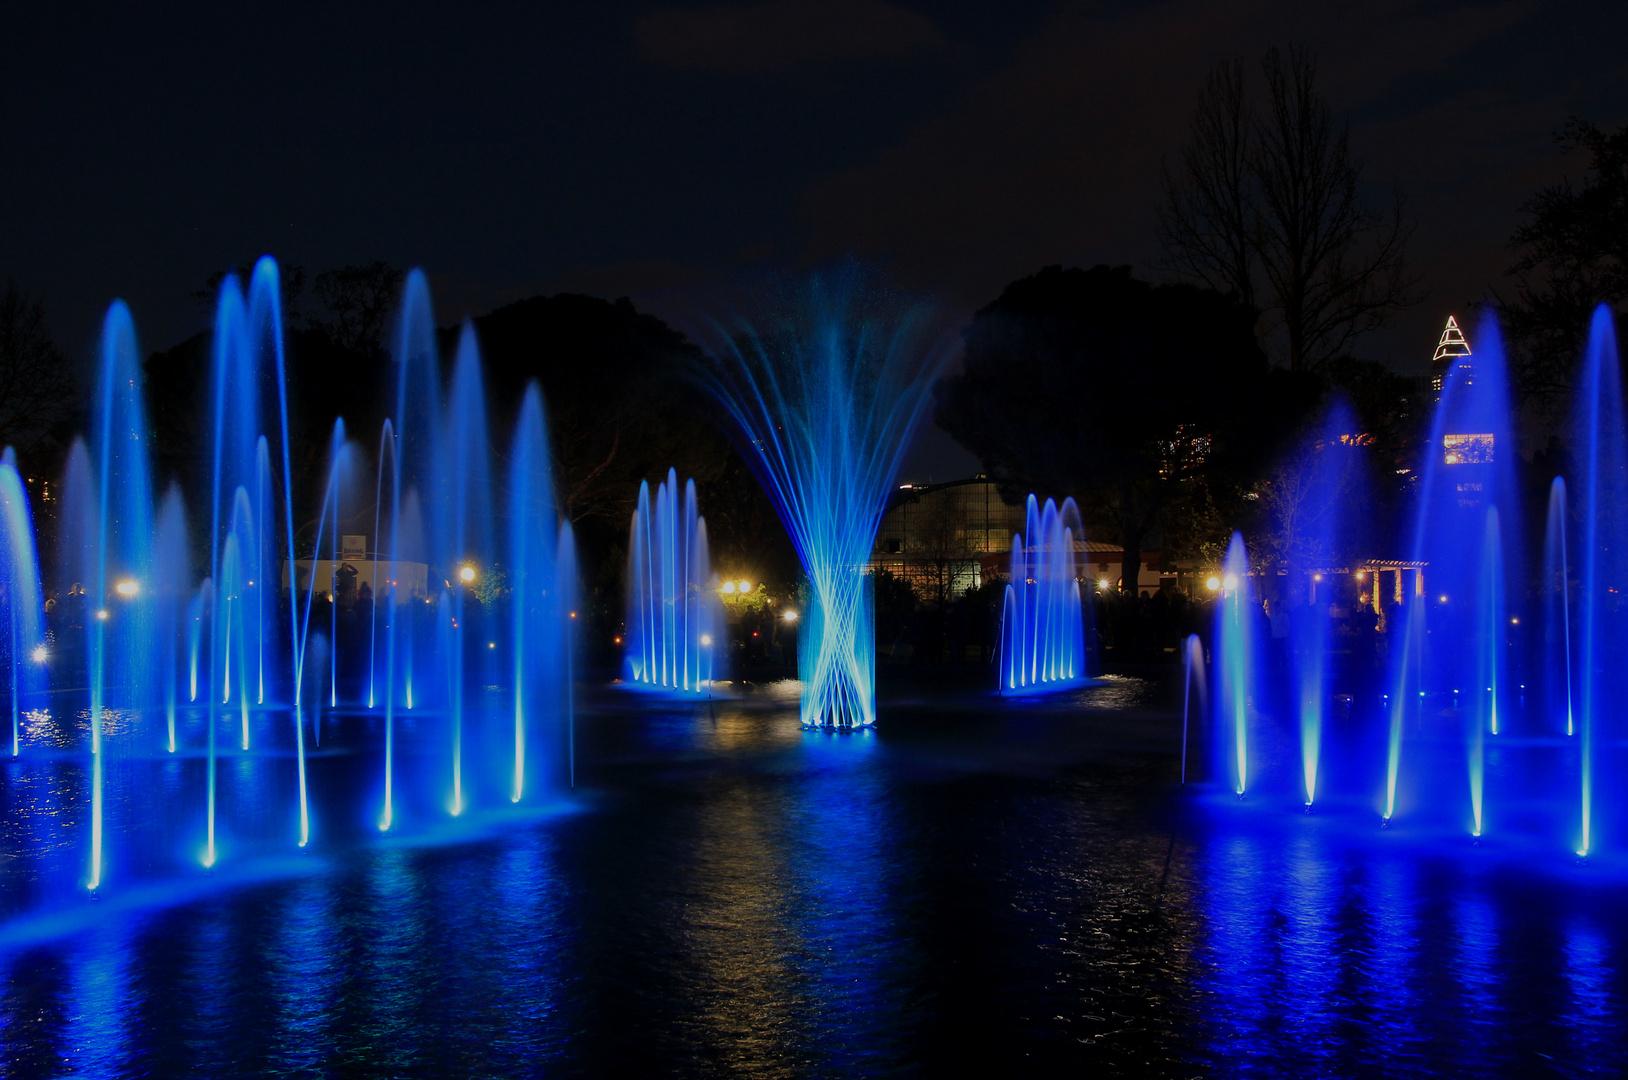 Oktogonbrunnen in blau Palmengarten Frankfurt Luminale 2012